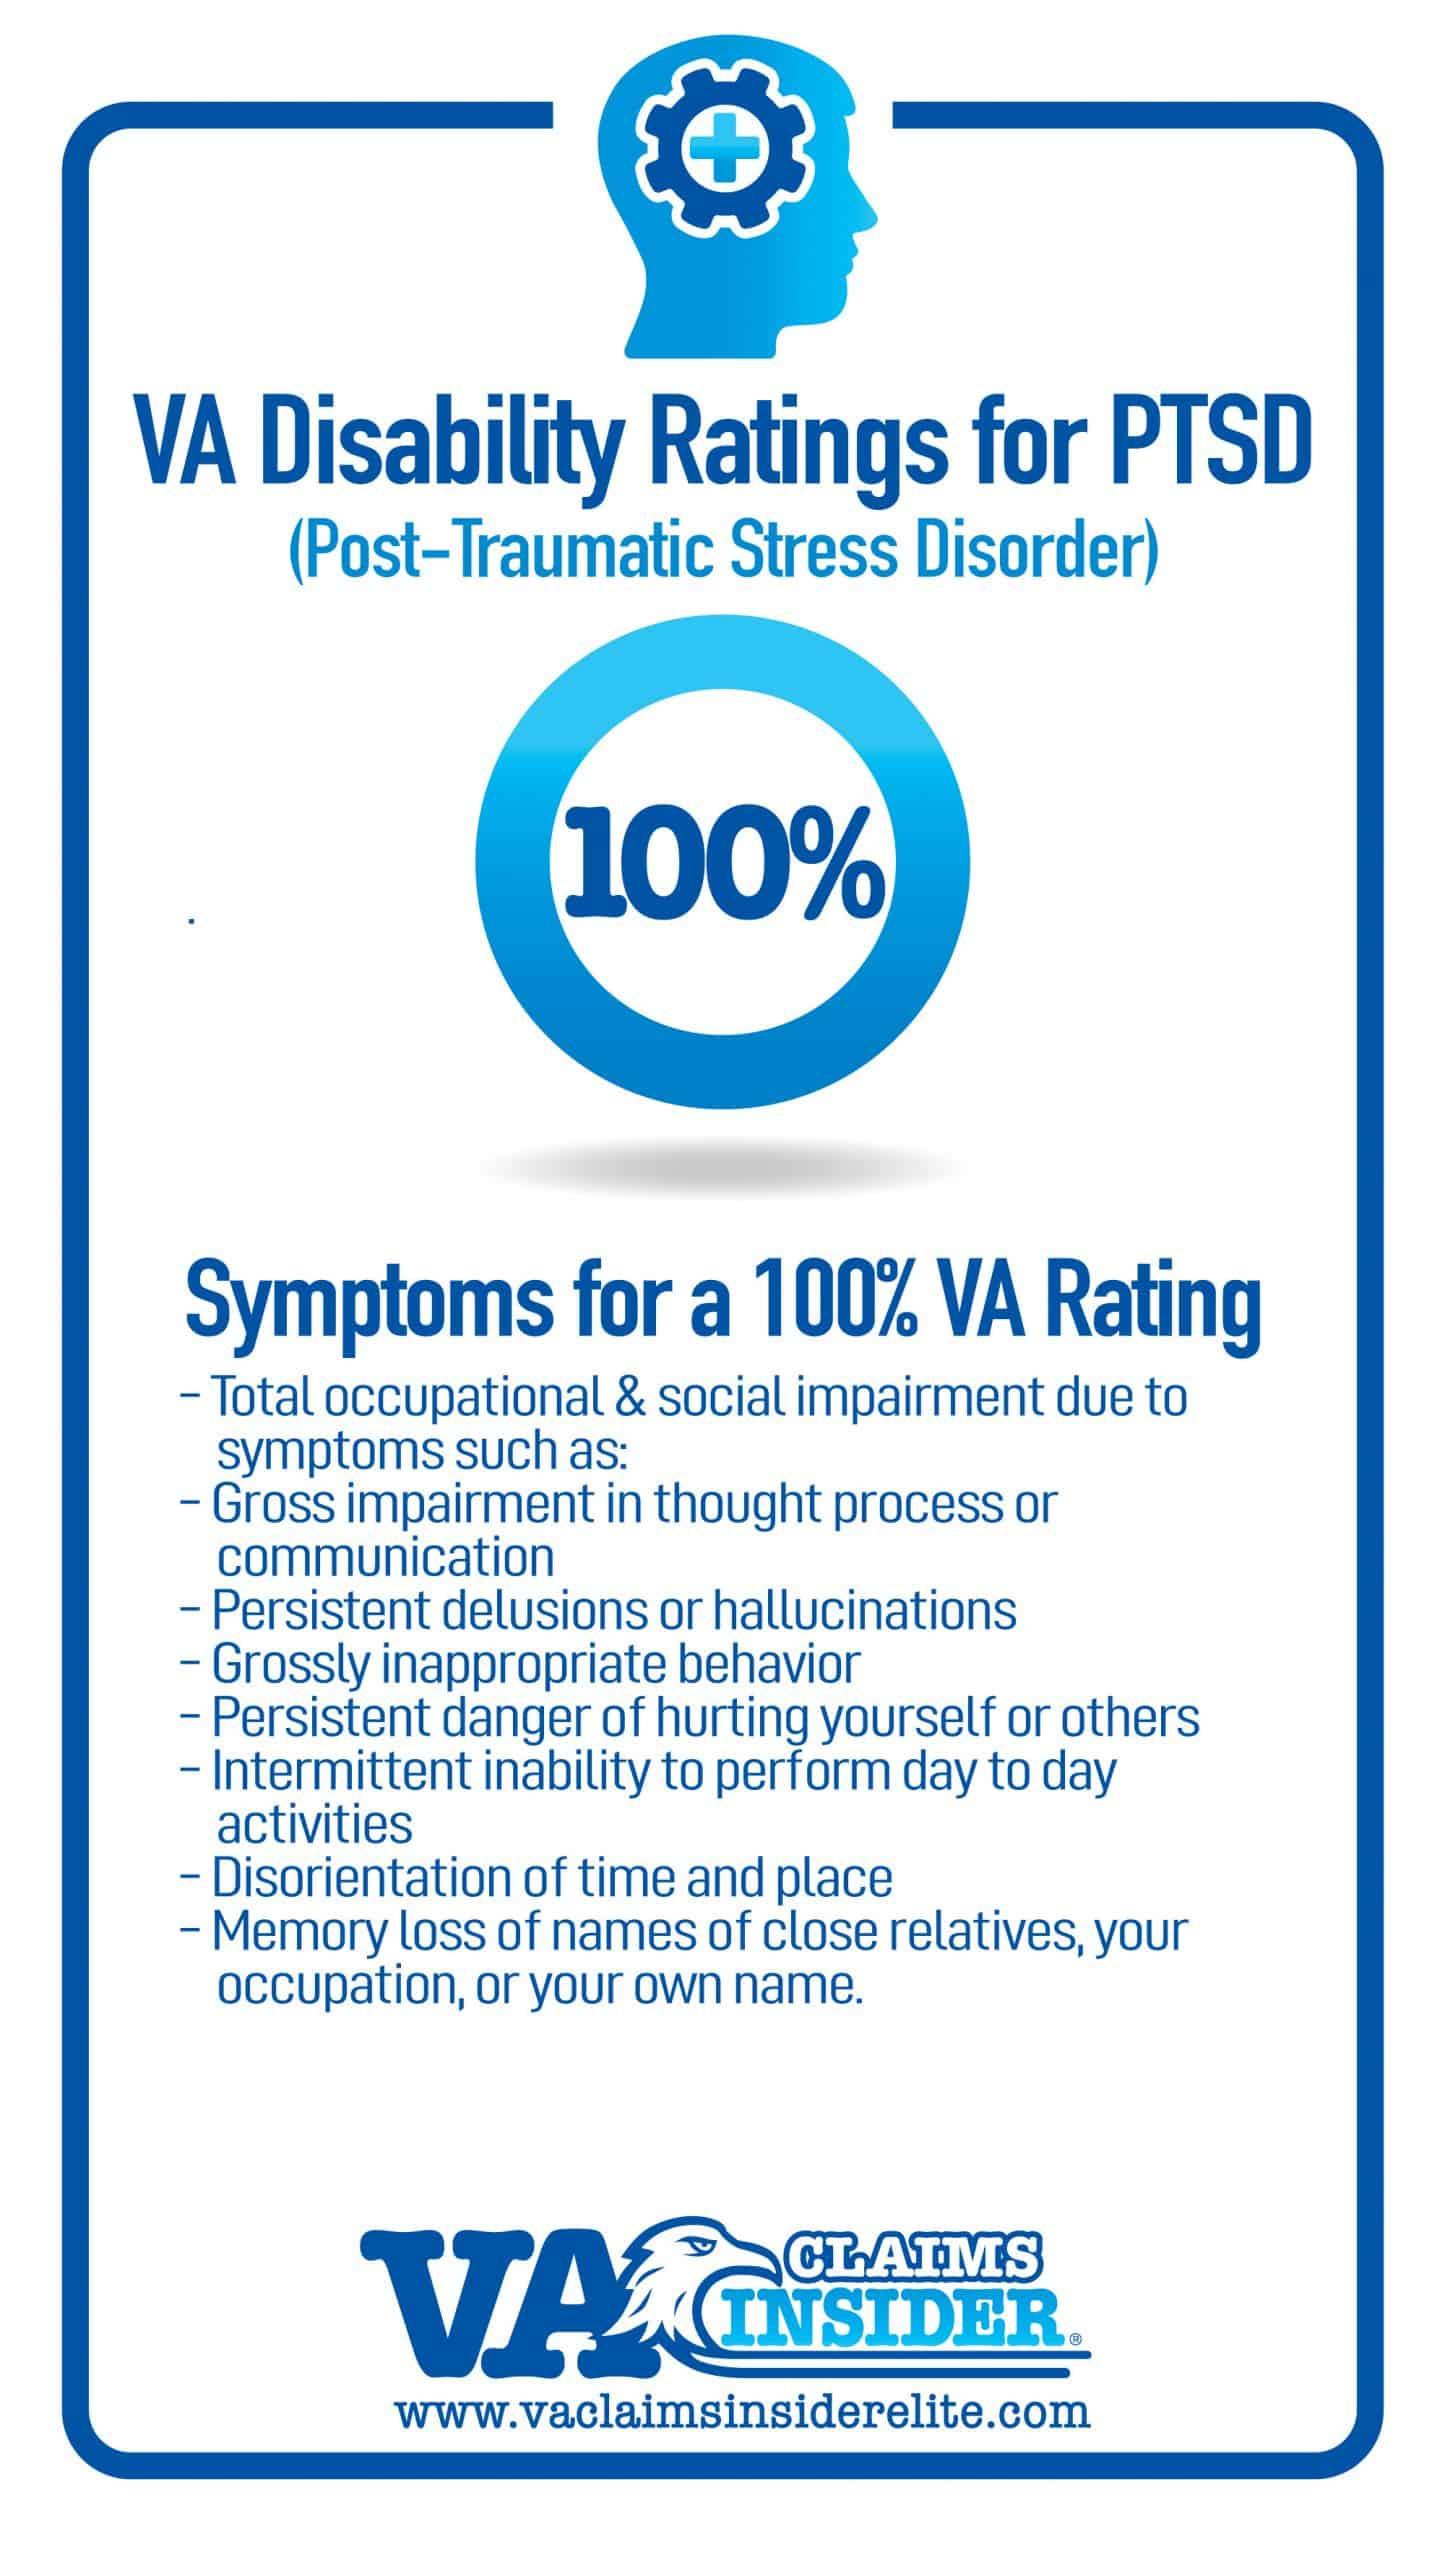 100% VA Rating for PTSD Symptoms List